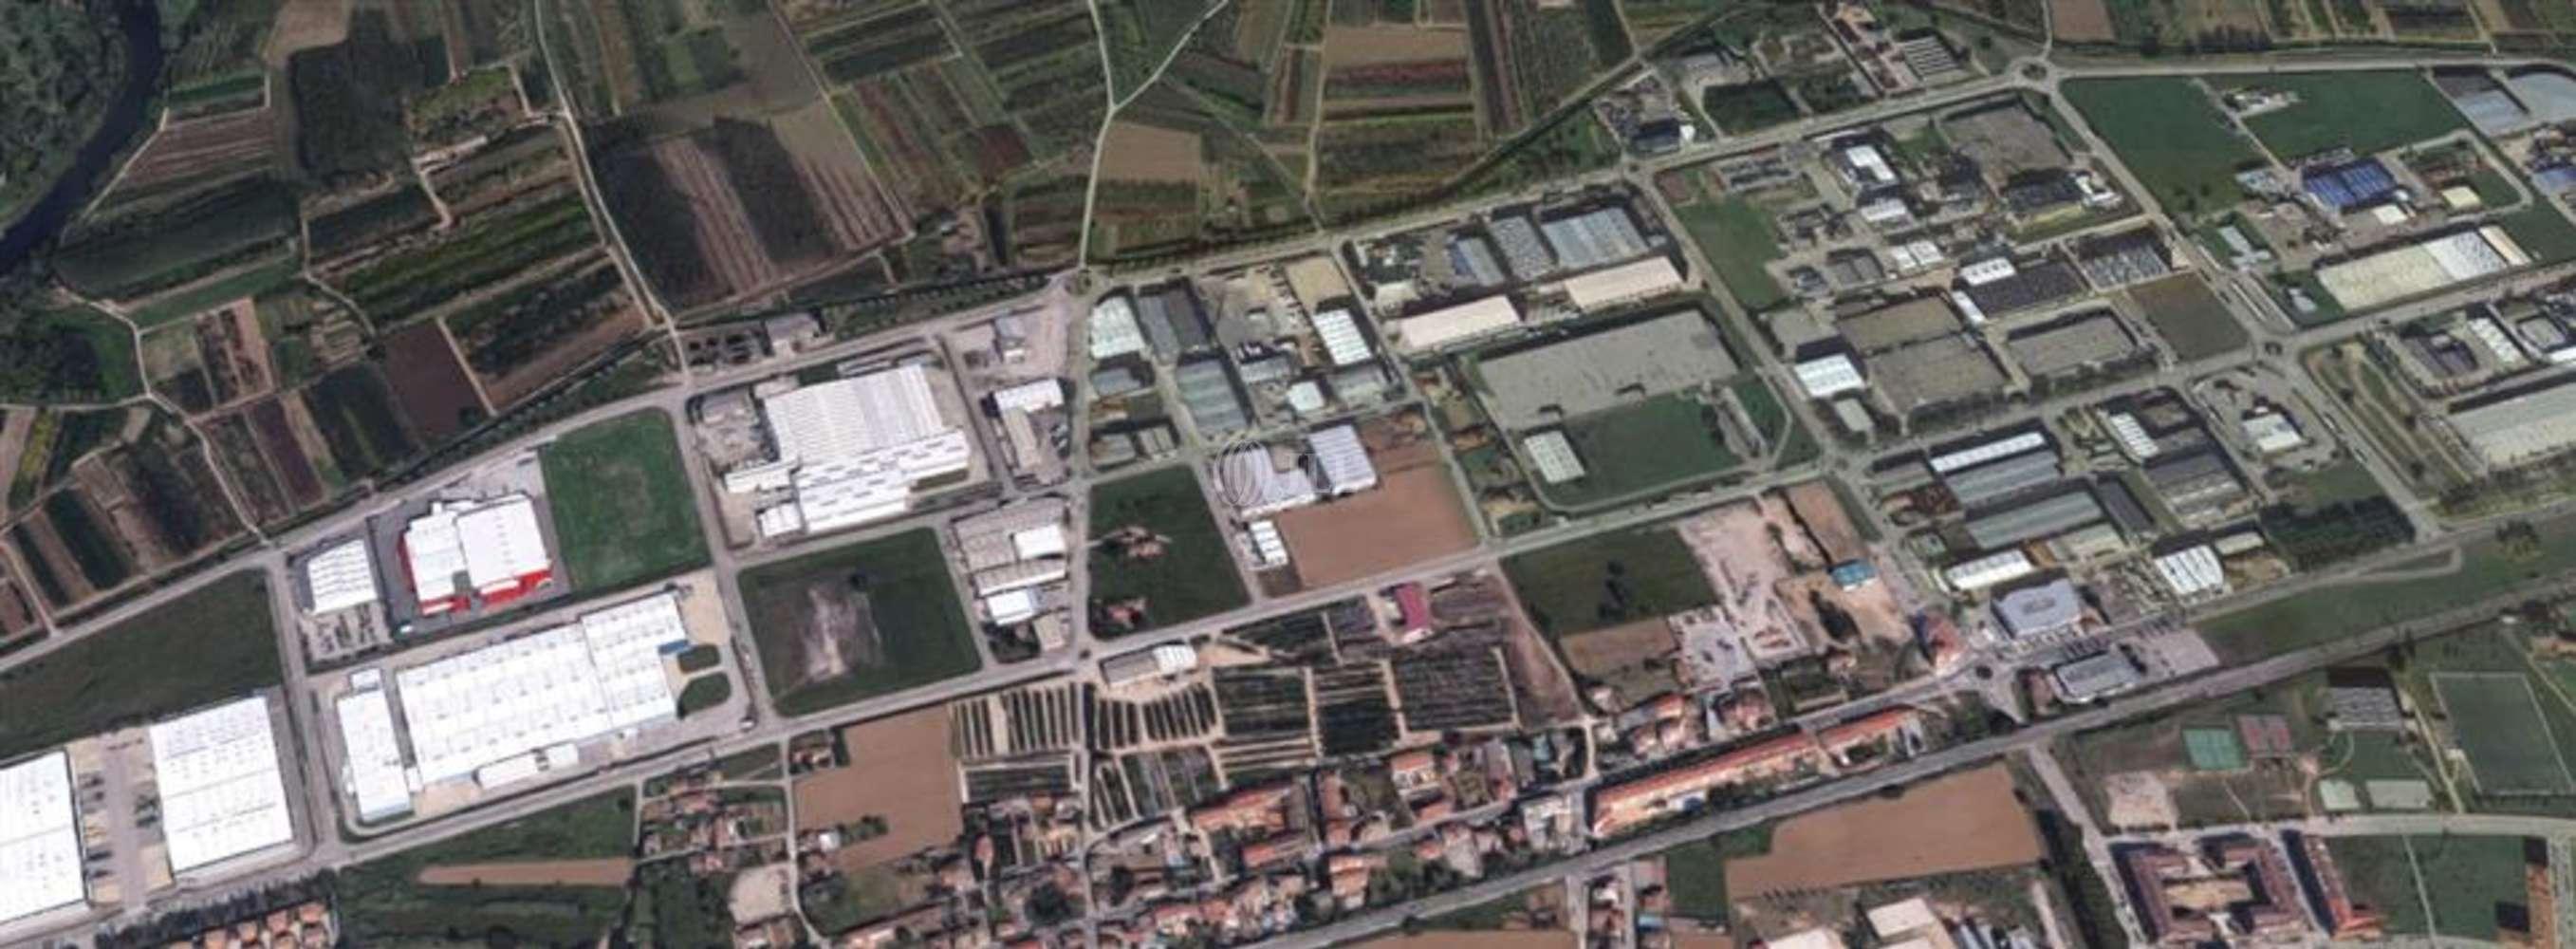 Naves industriales y logísticas Celrà, 17460 - Nave Logistica - B0401 - PI CELRÀ